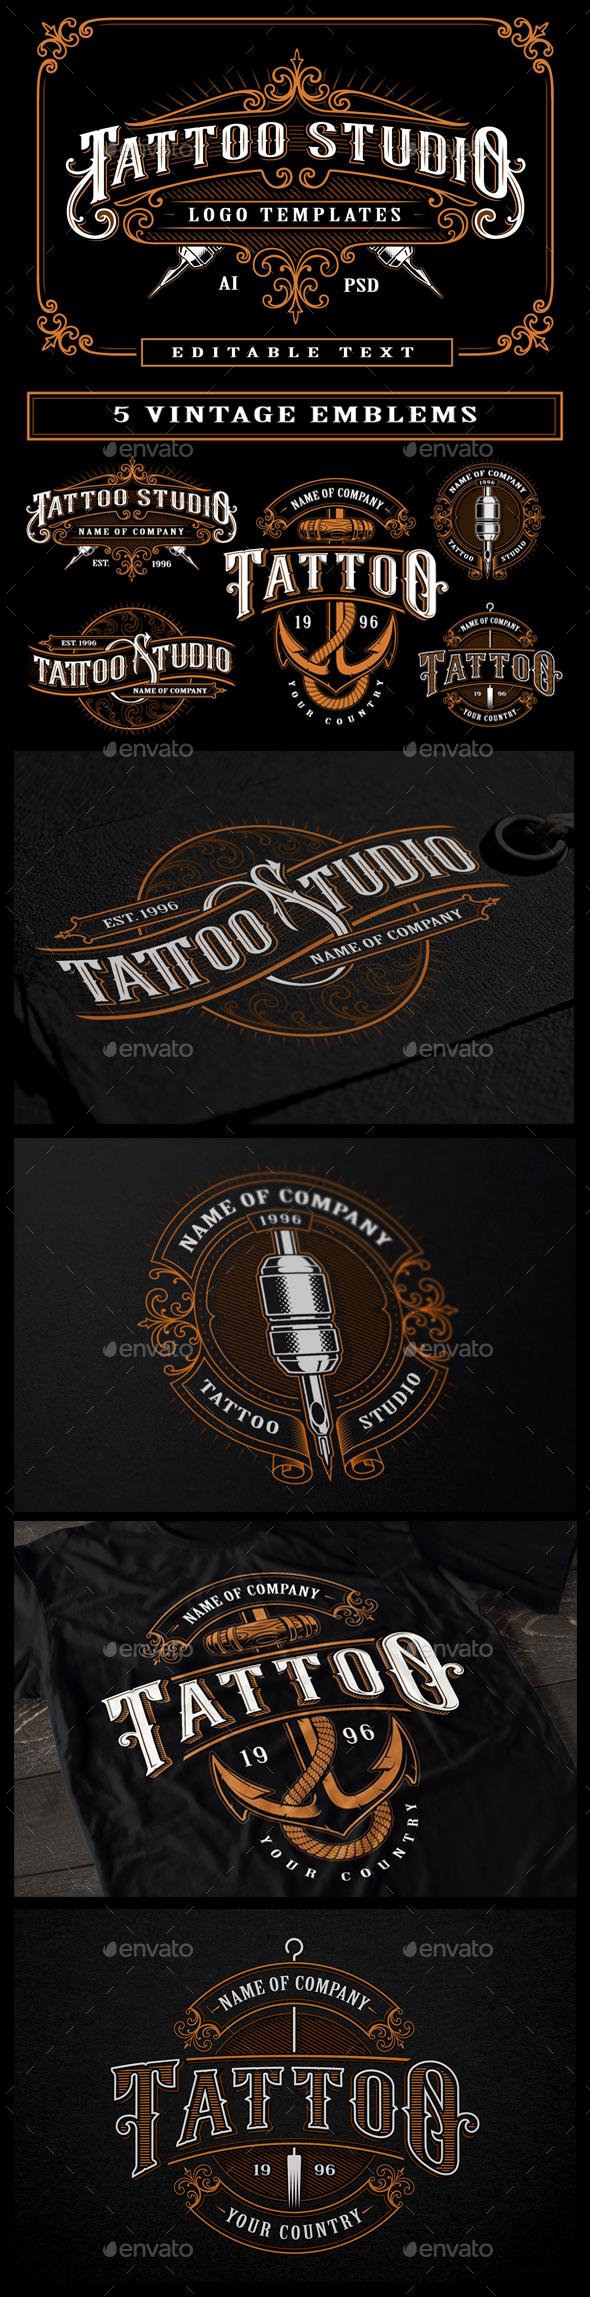 Set of Vintage Tattoo Studio Badges - Retro Technology